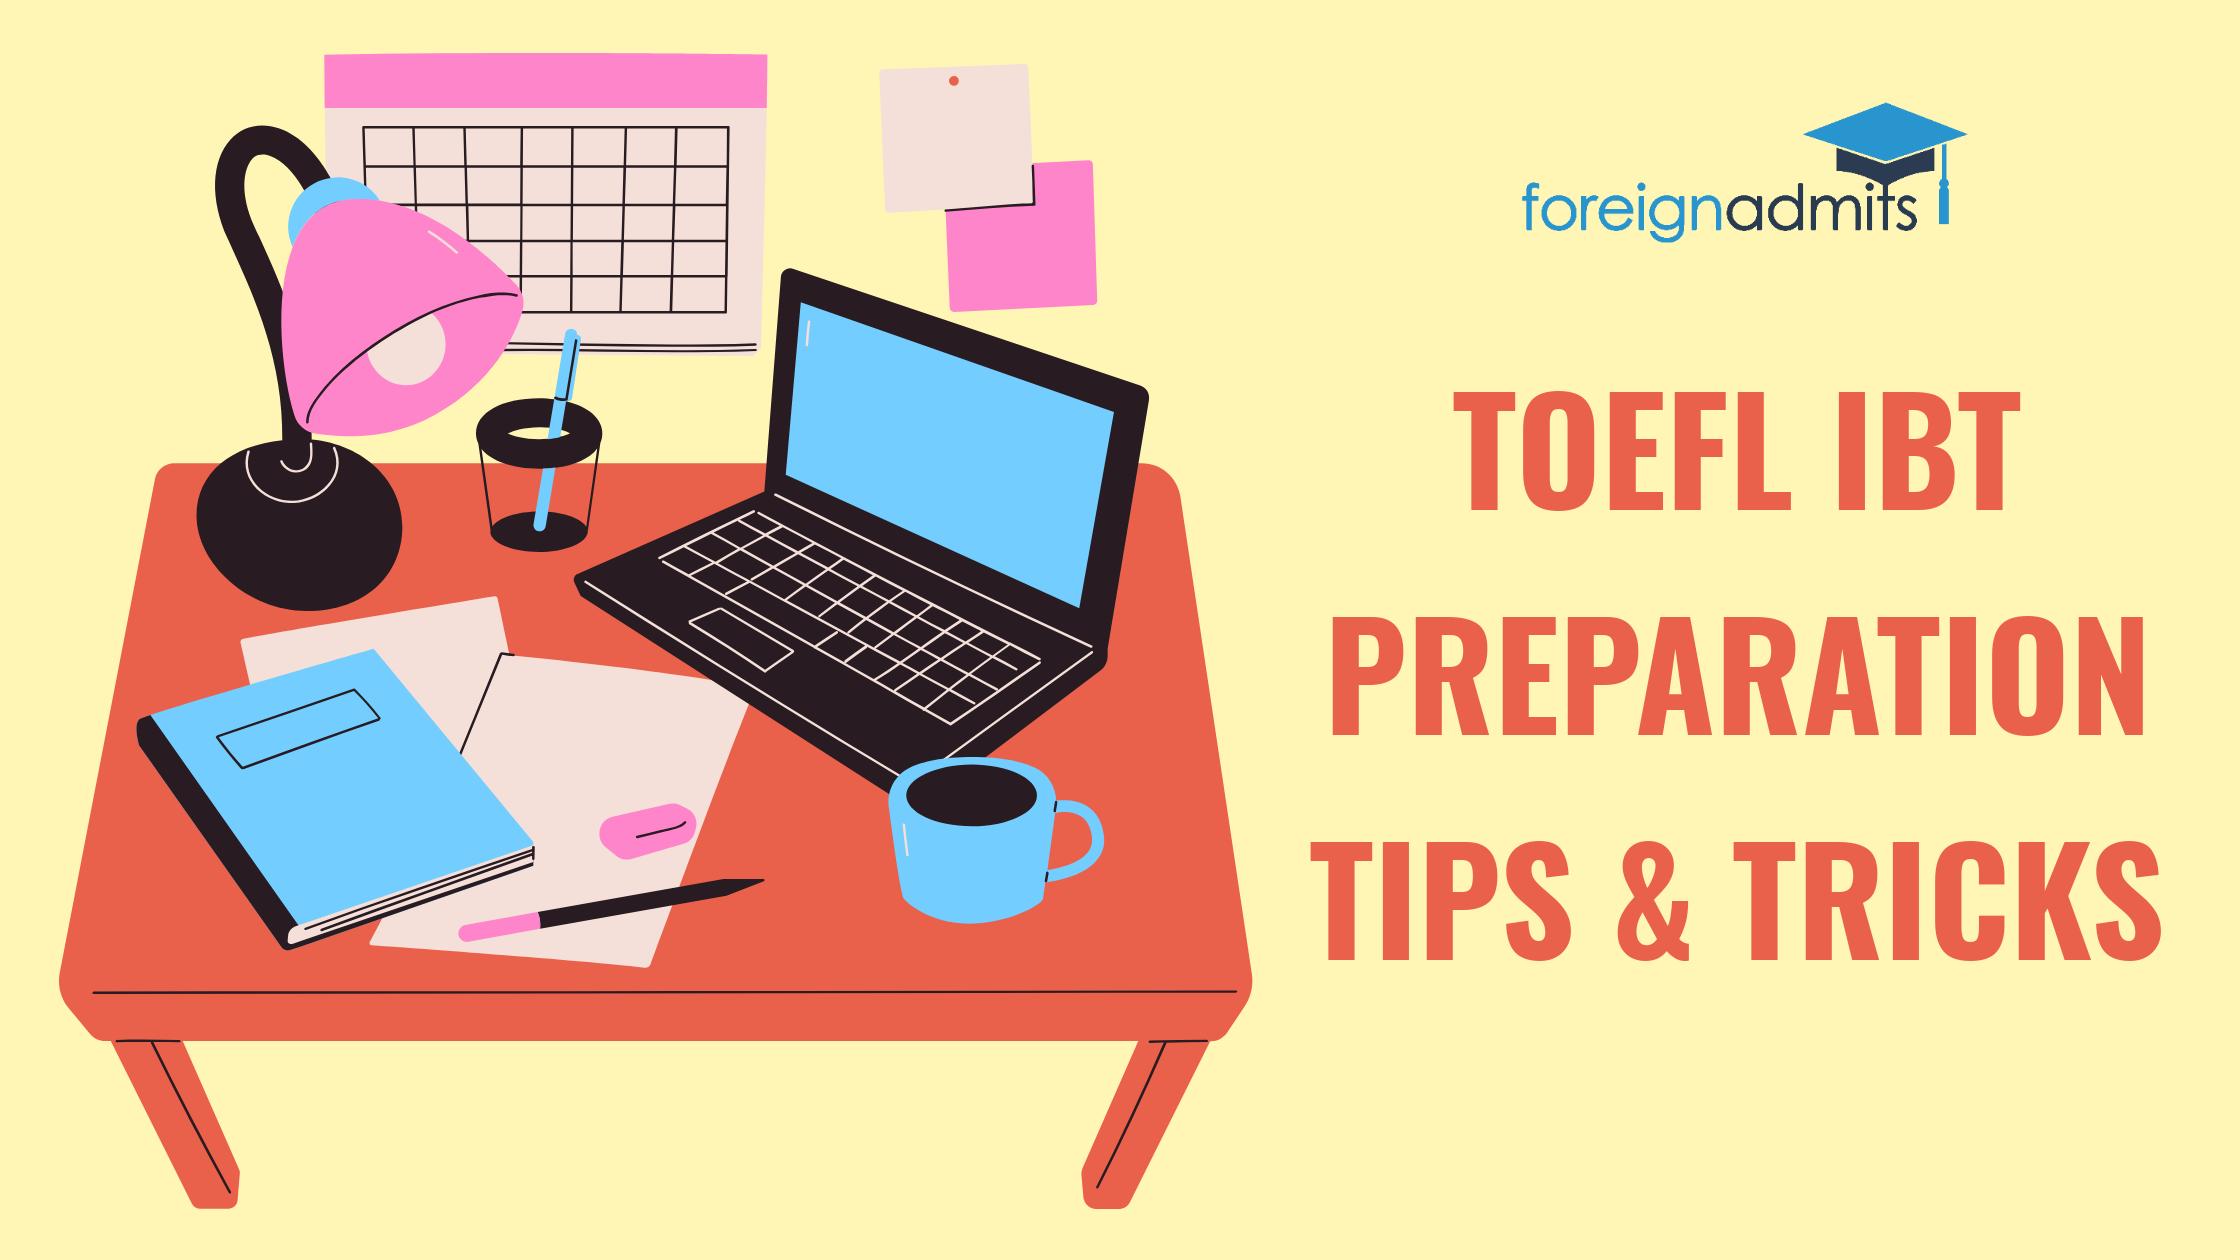 TOEFL iBT preparation tips and tricks